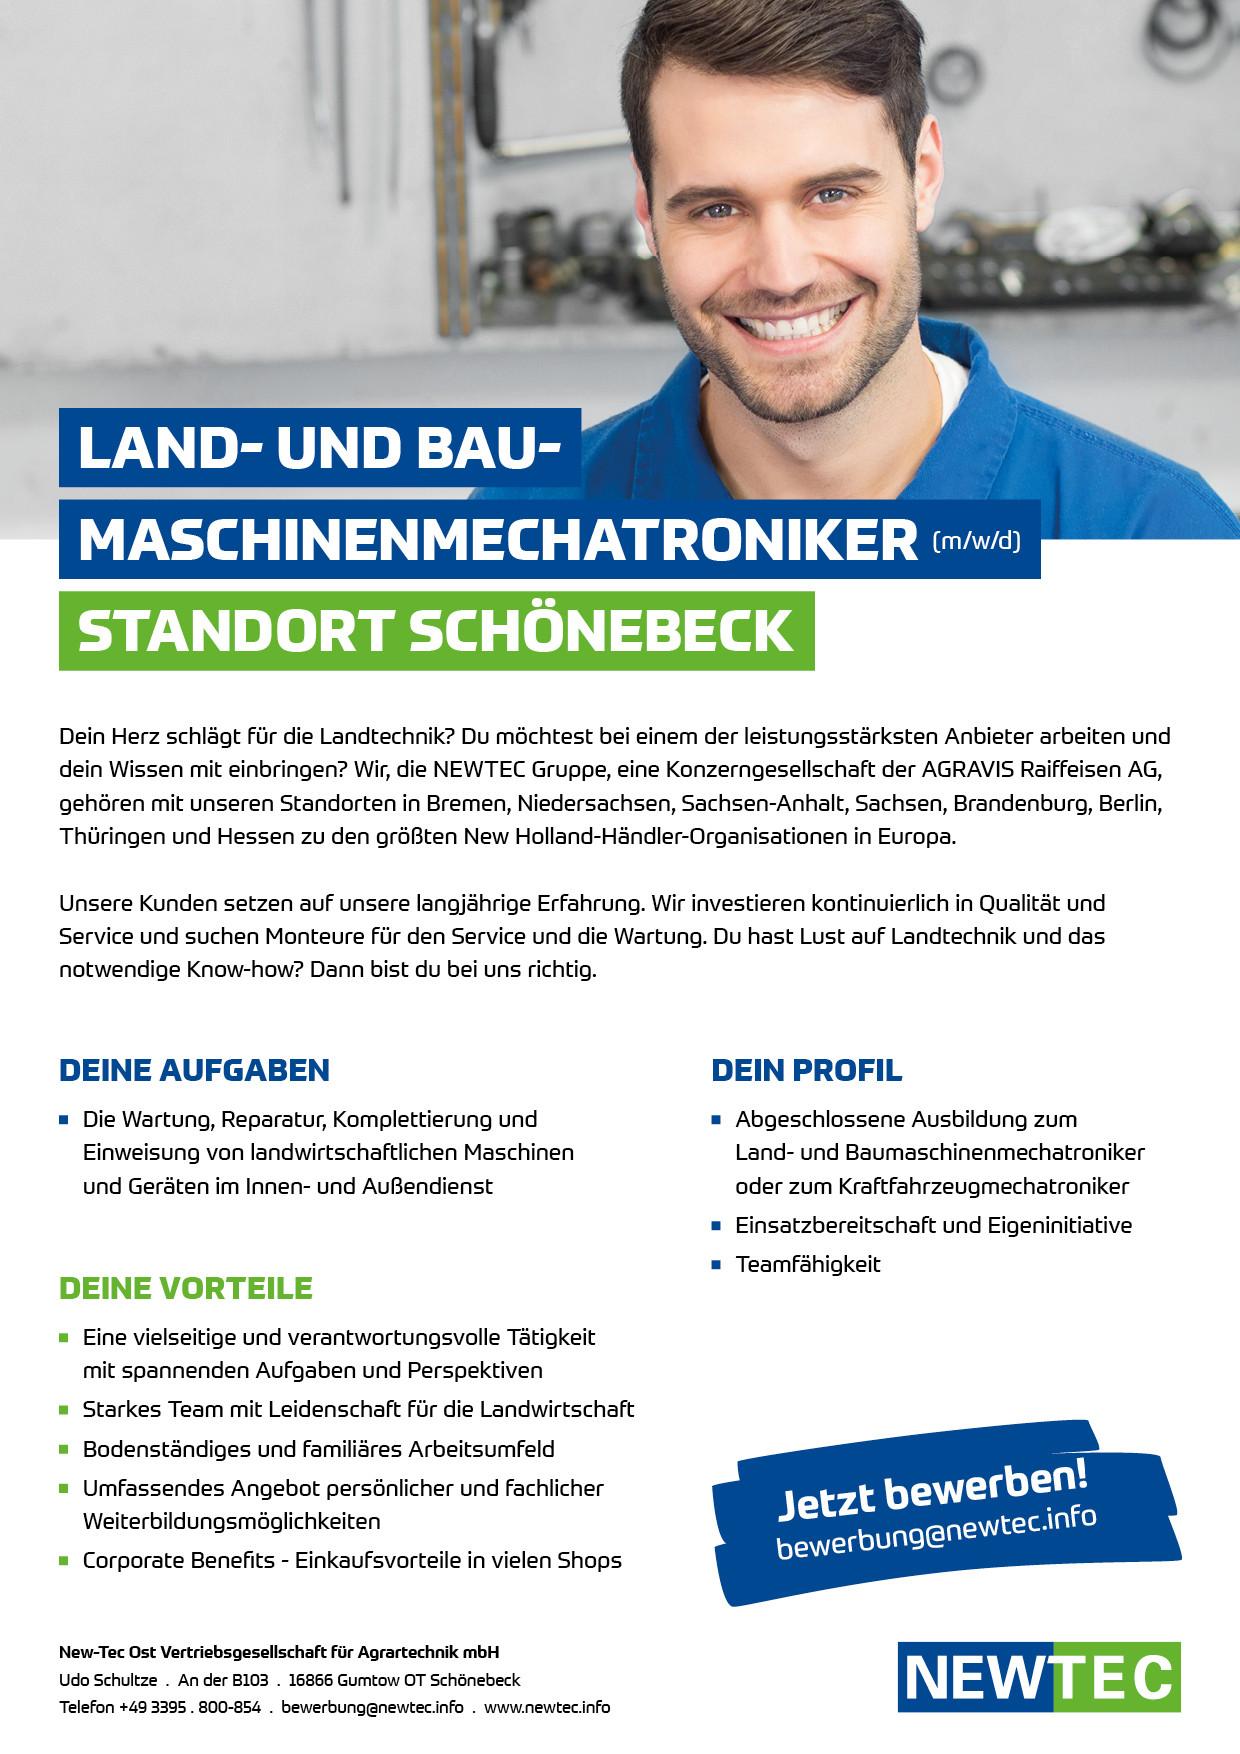 SCREEN_TE-NTOST-2021-29651_Stellenanzeige_Land-_und_Baumaschinenmechatroniker_Schoenebeck